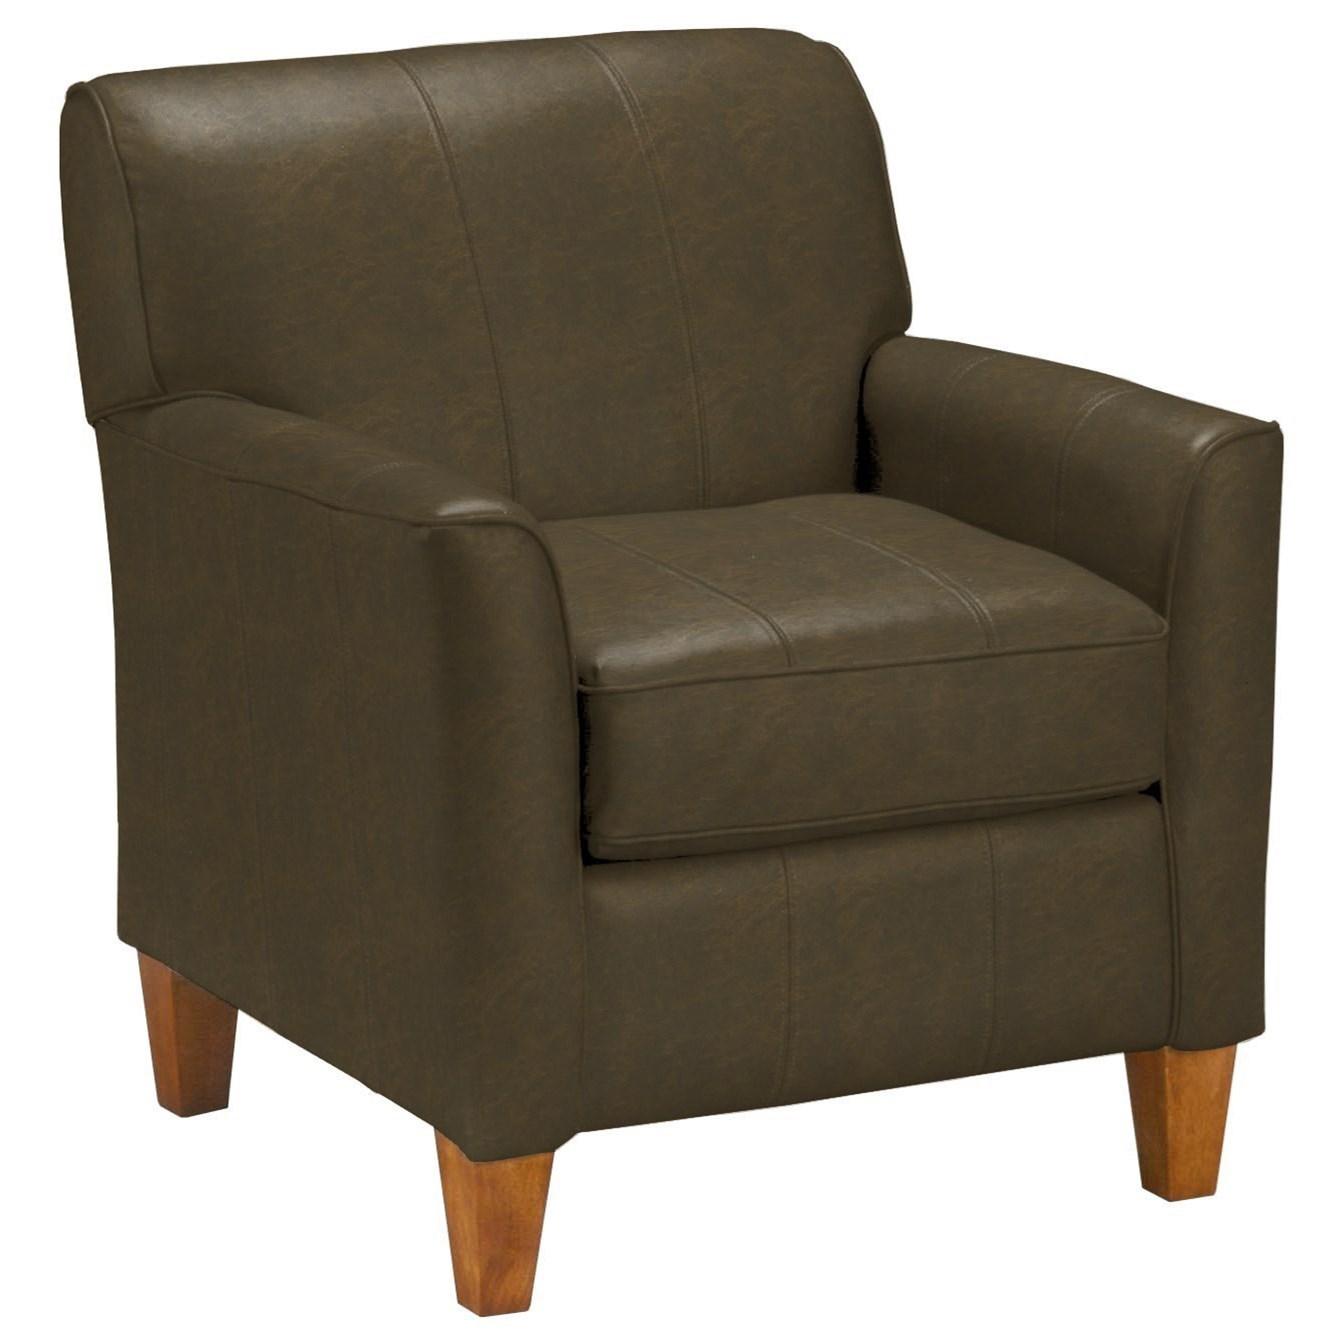 Best Home Furnishings Chairs - Club Risa Club Chair - Item Number: 4190-24786U